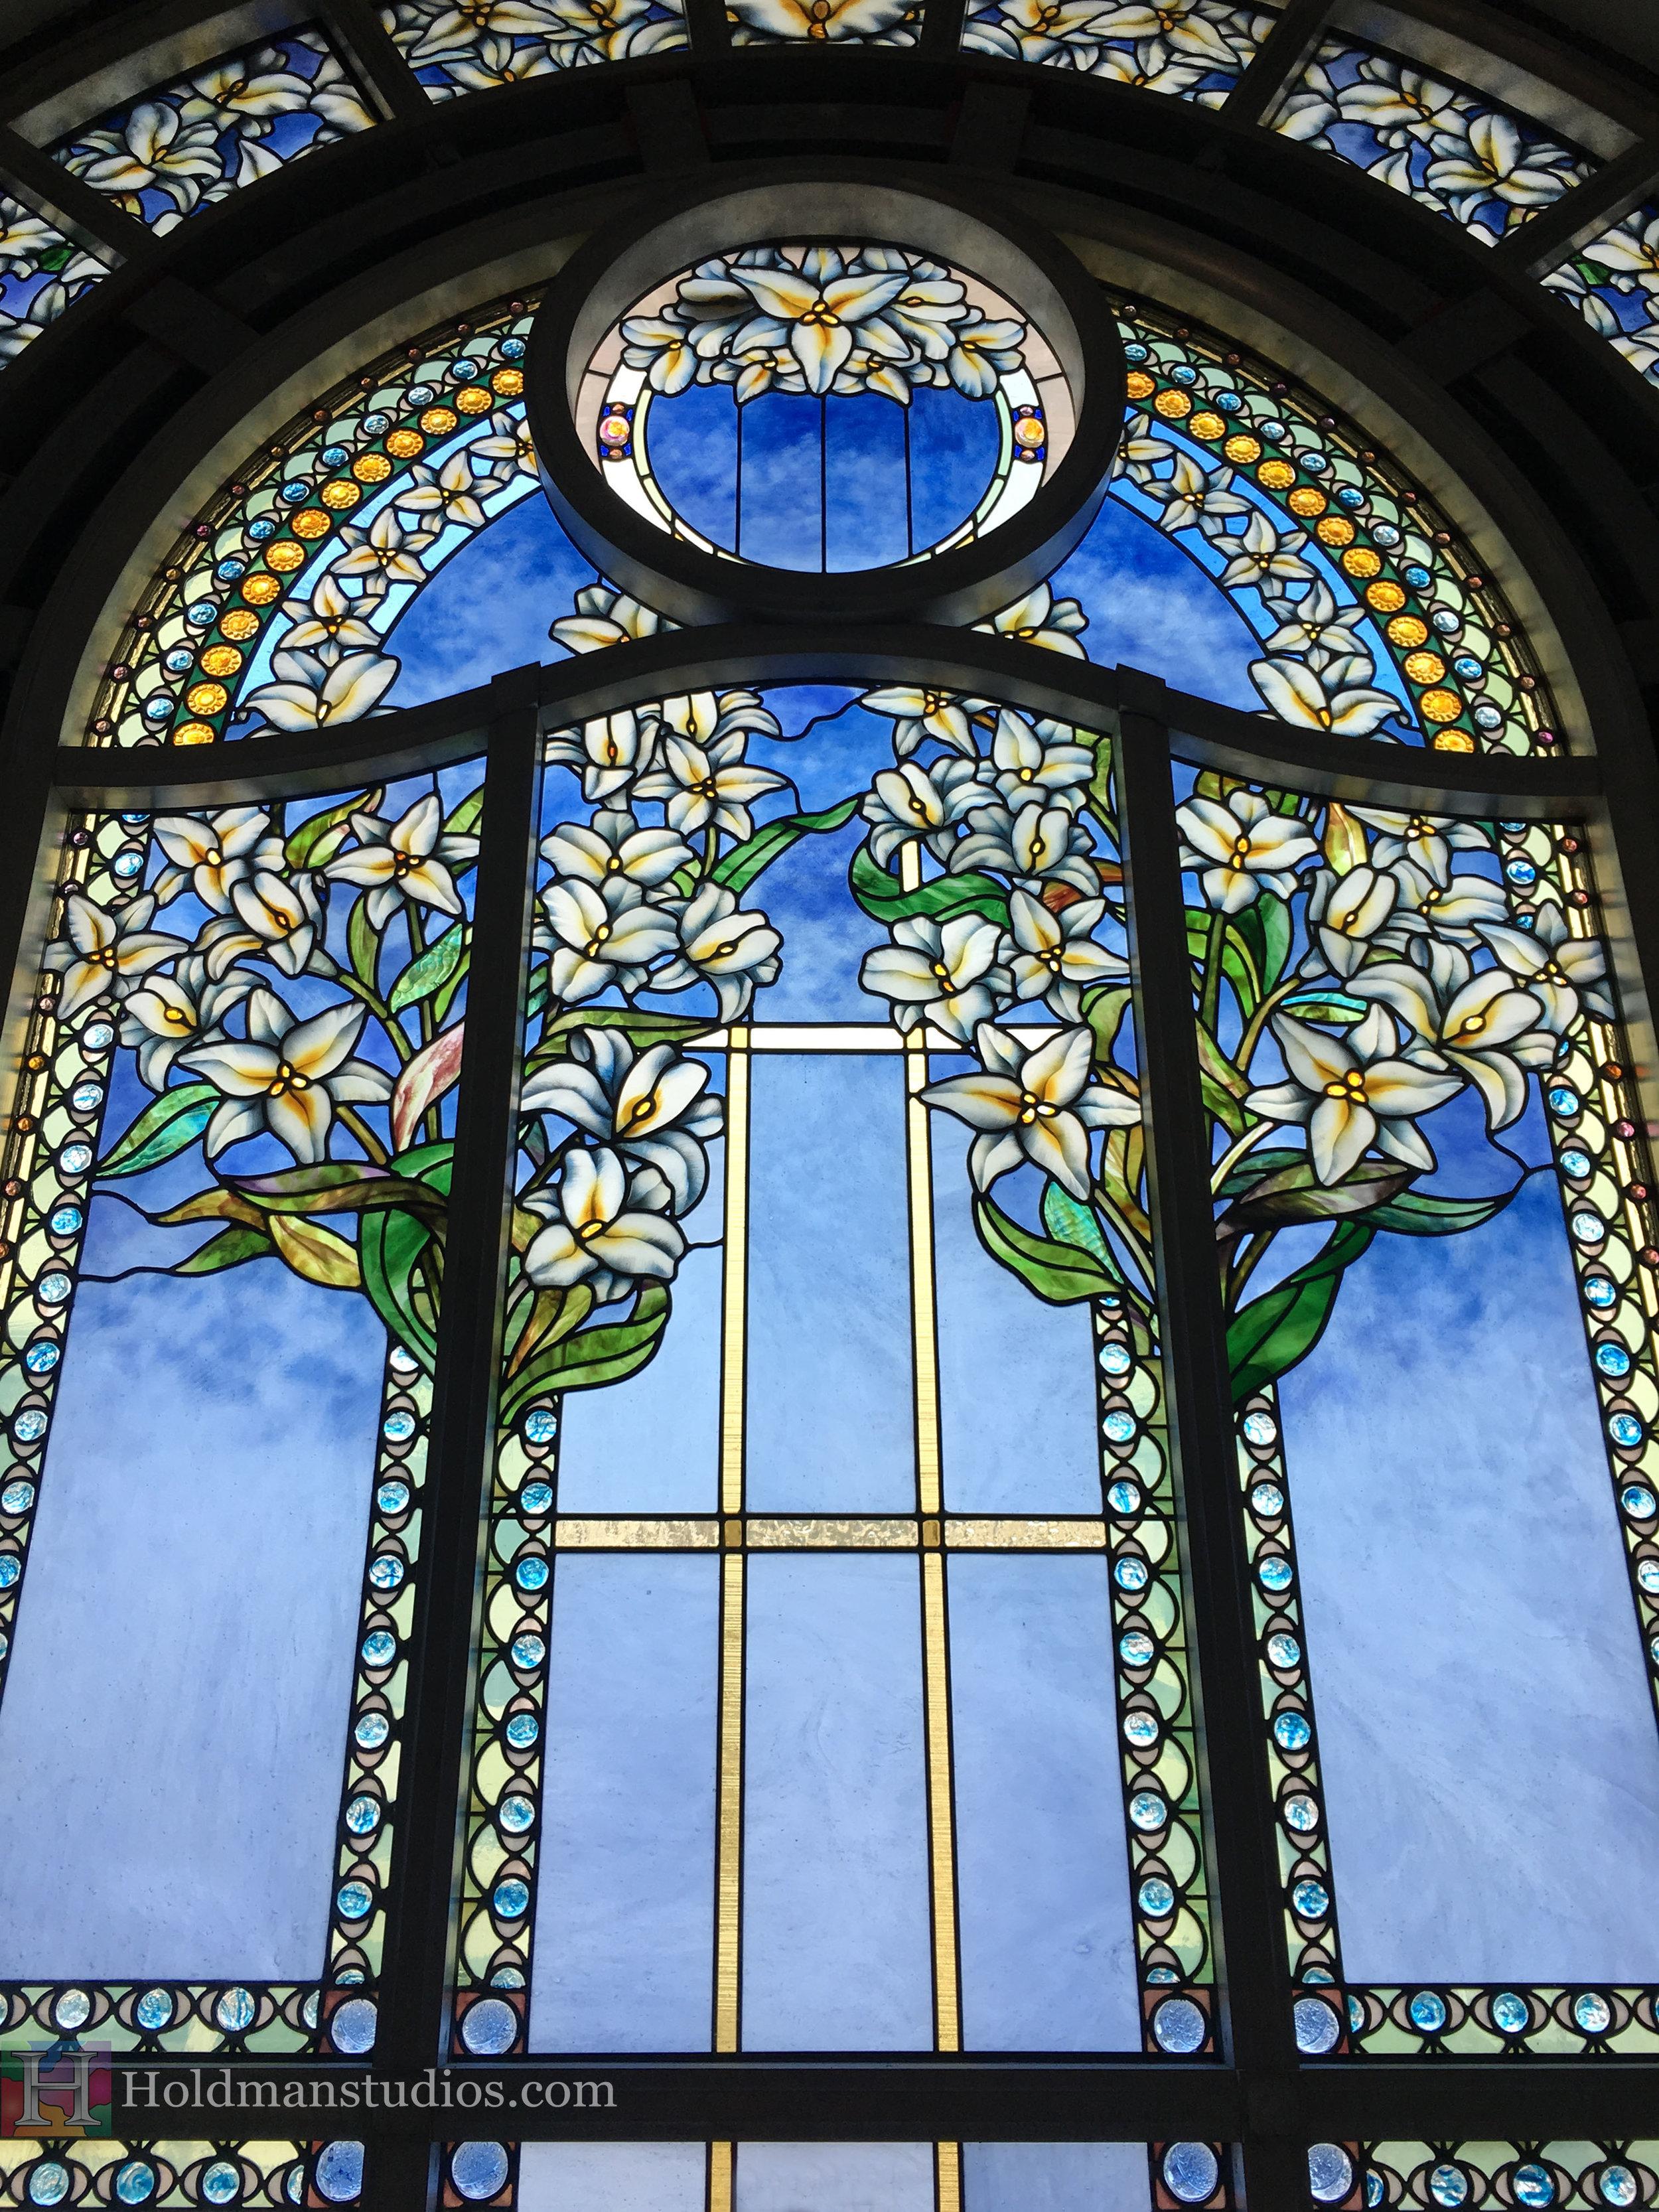 Holdman-Studios-Paris-LDS-Temple-Stained-Glass-Madonna-Lily-Flowers-Leaves-Sun-Moon-Stars-Window.jpg